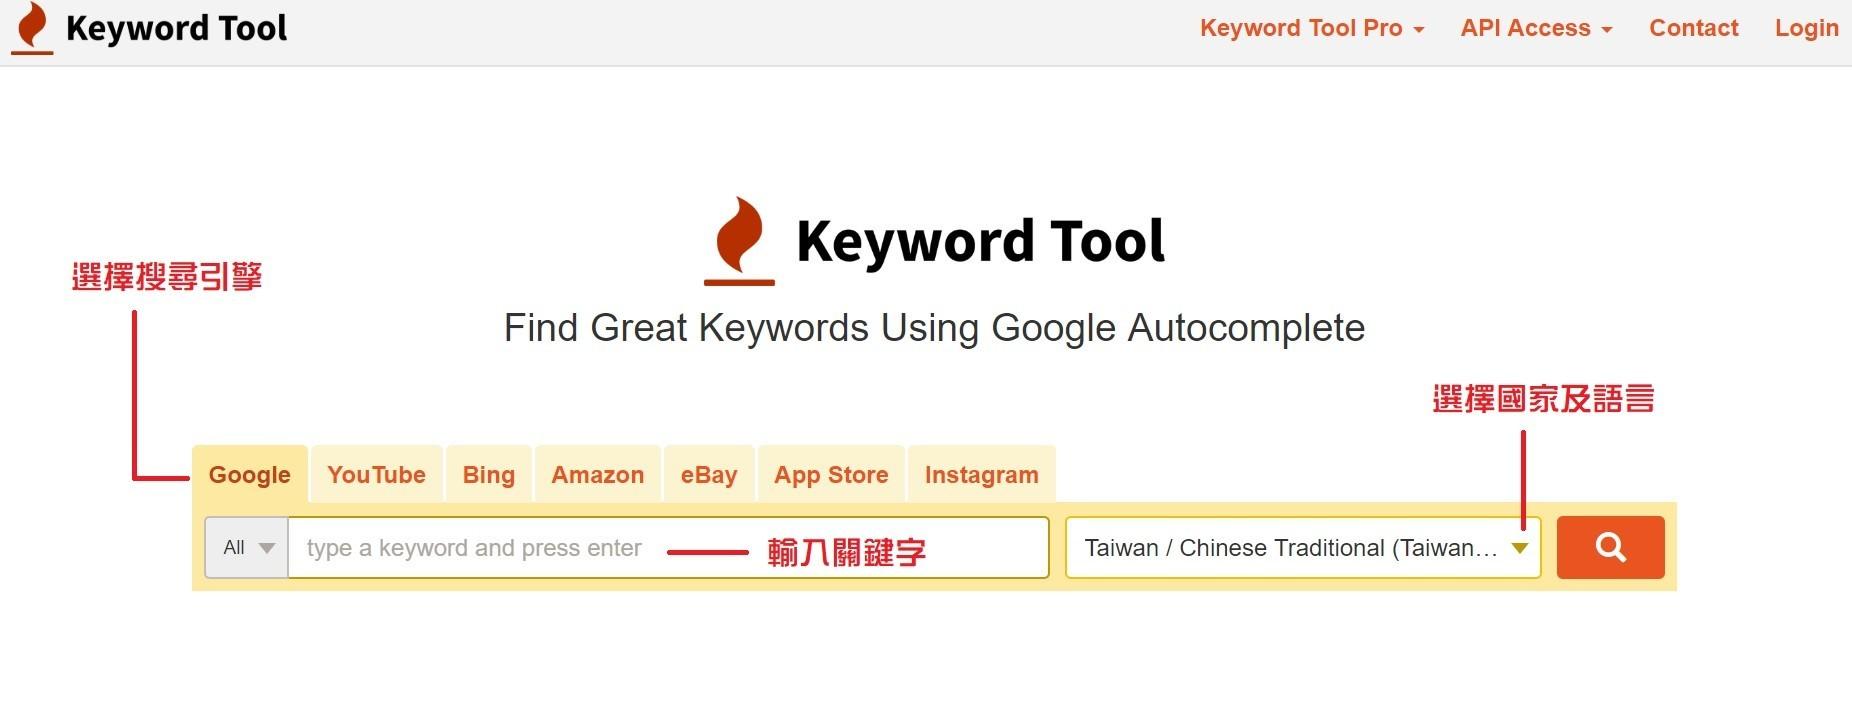 使用Keyworld Tool搜索關鍵字